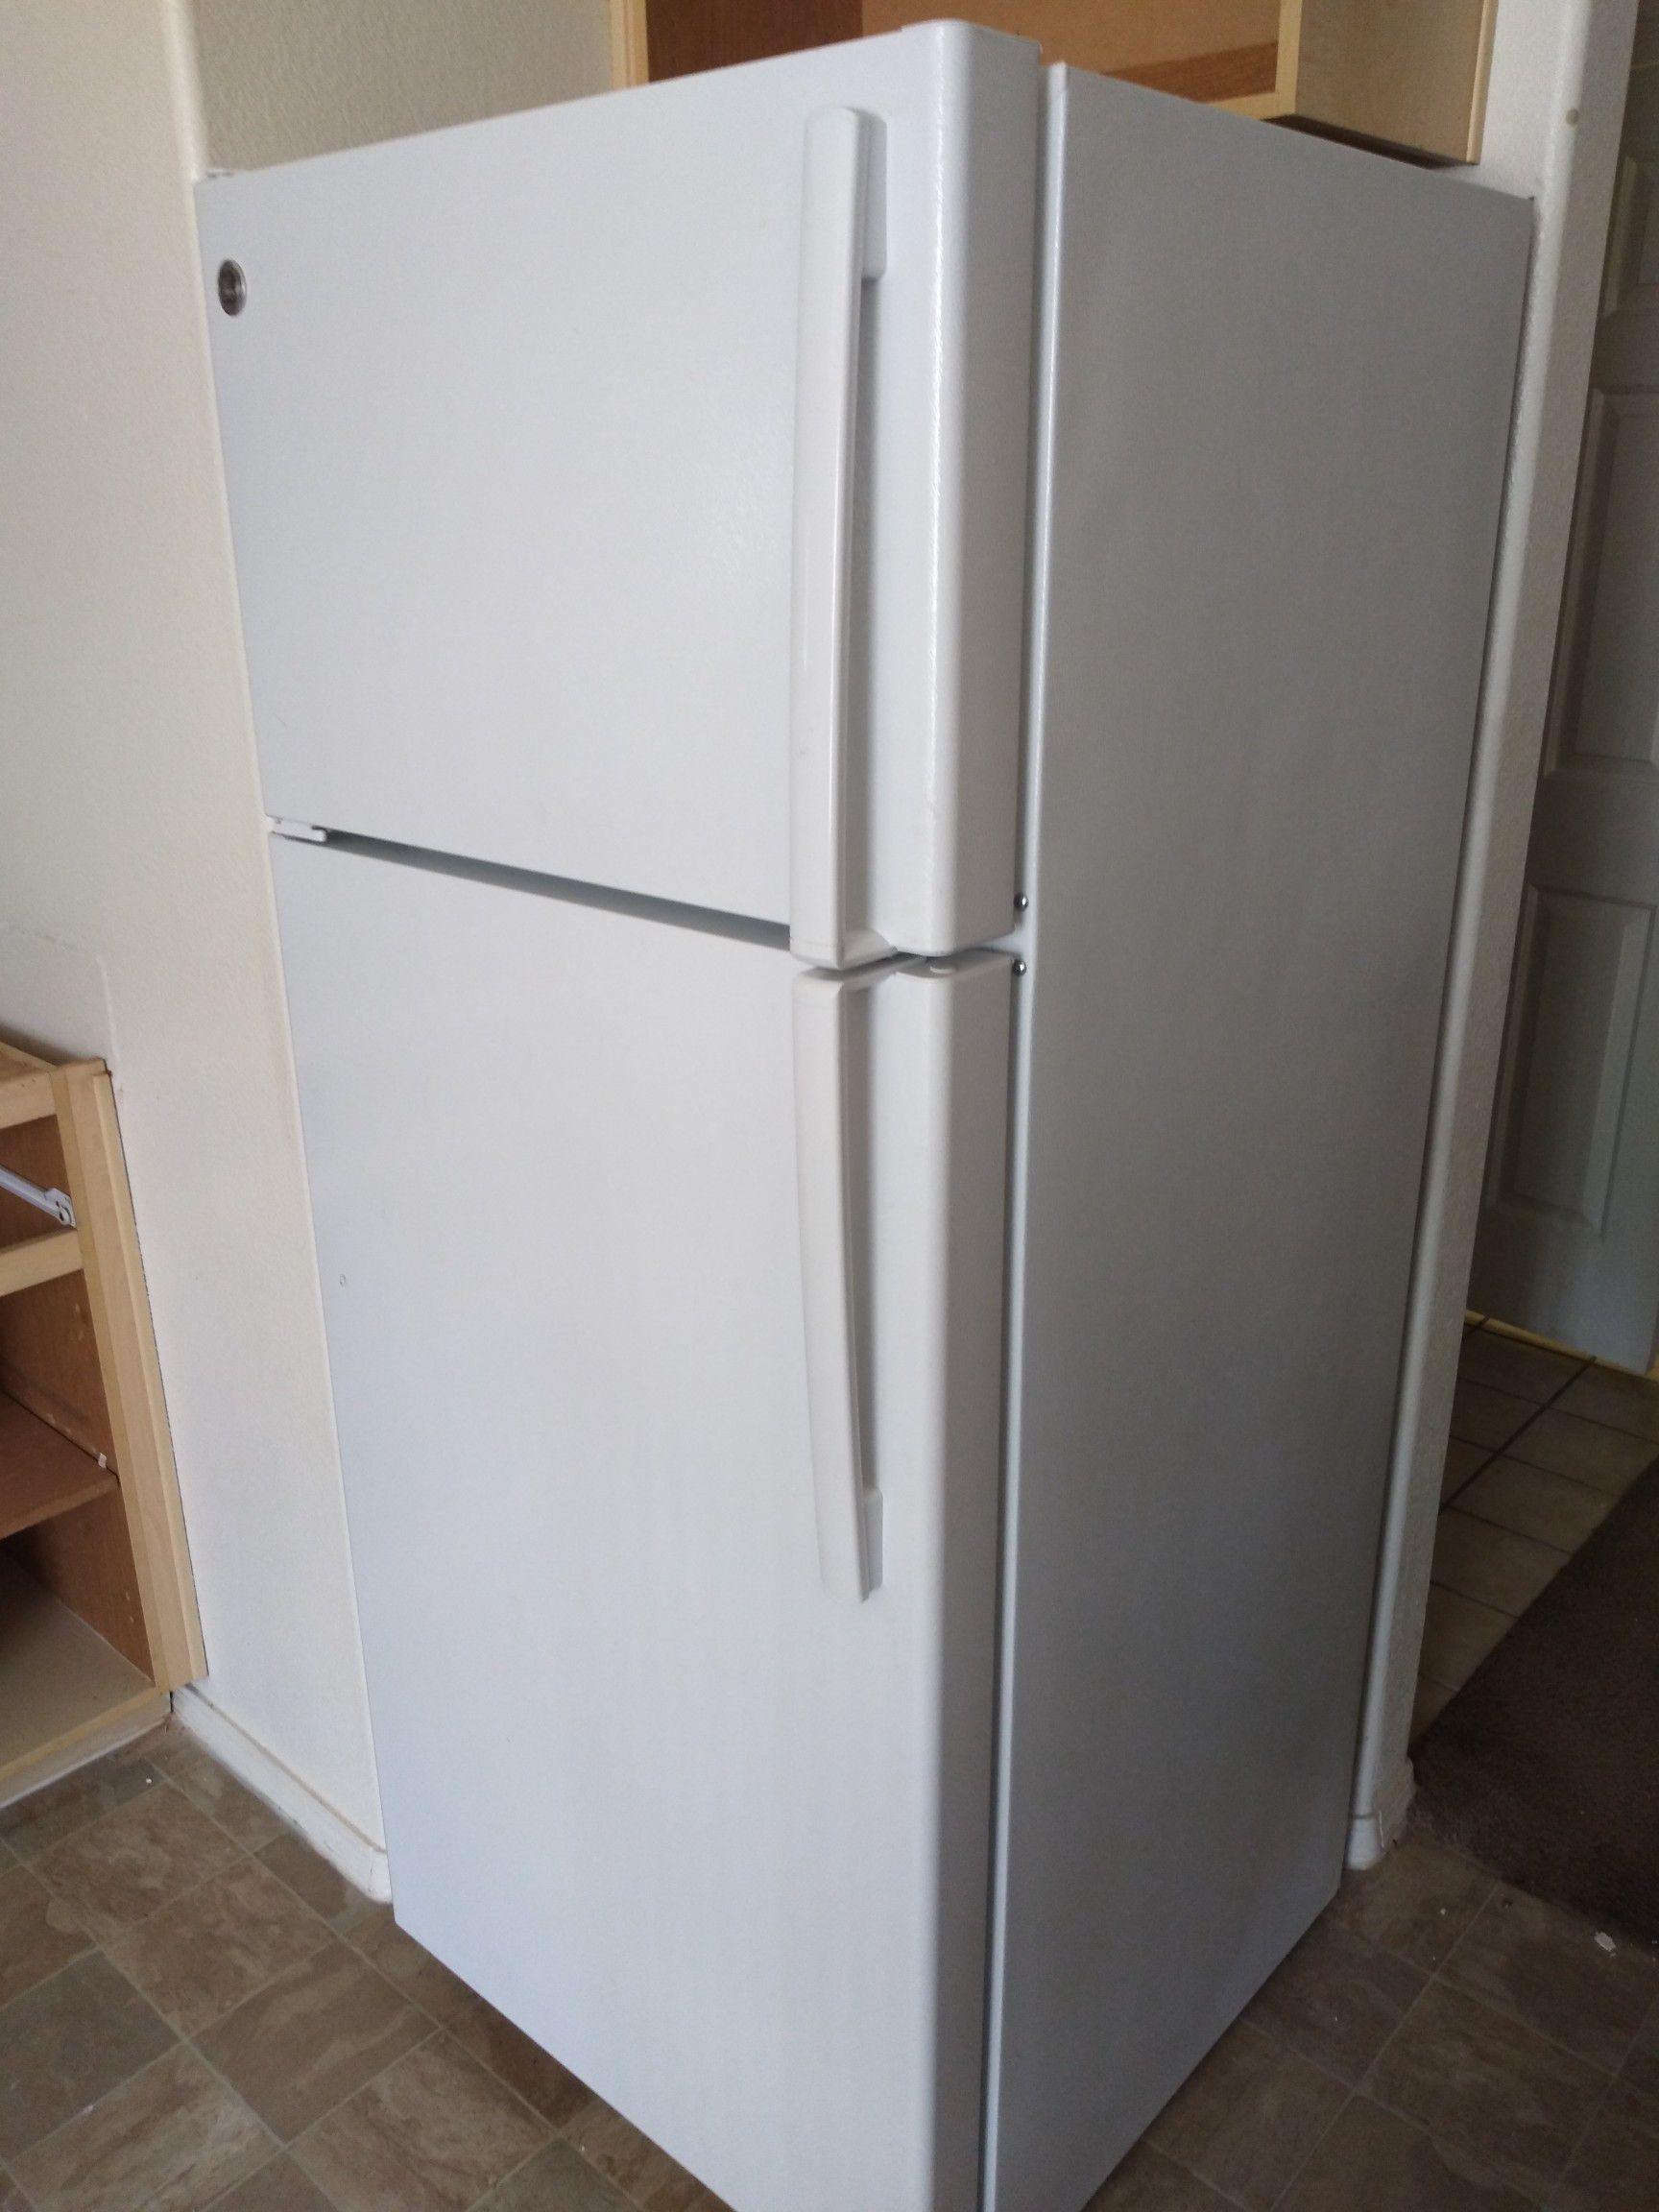 2018 model GE refrigerator